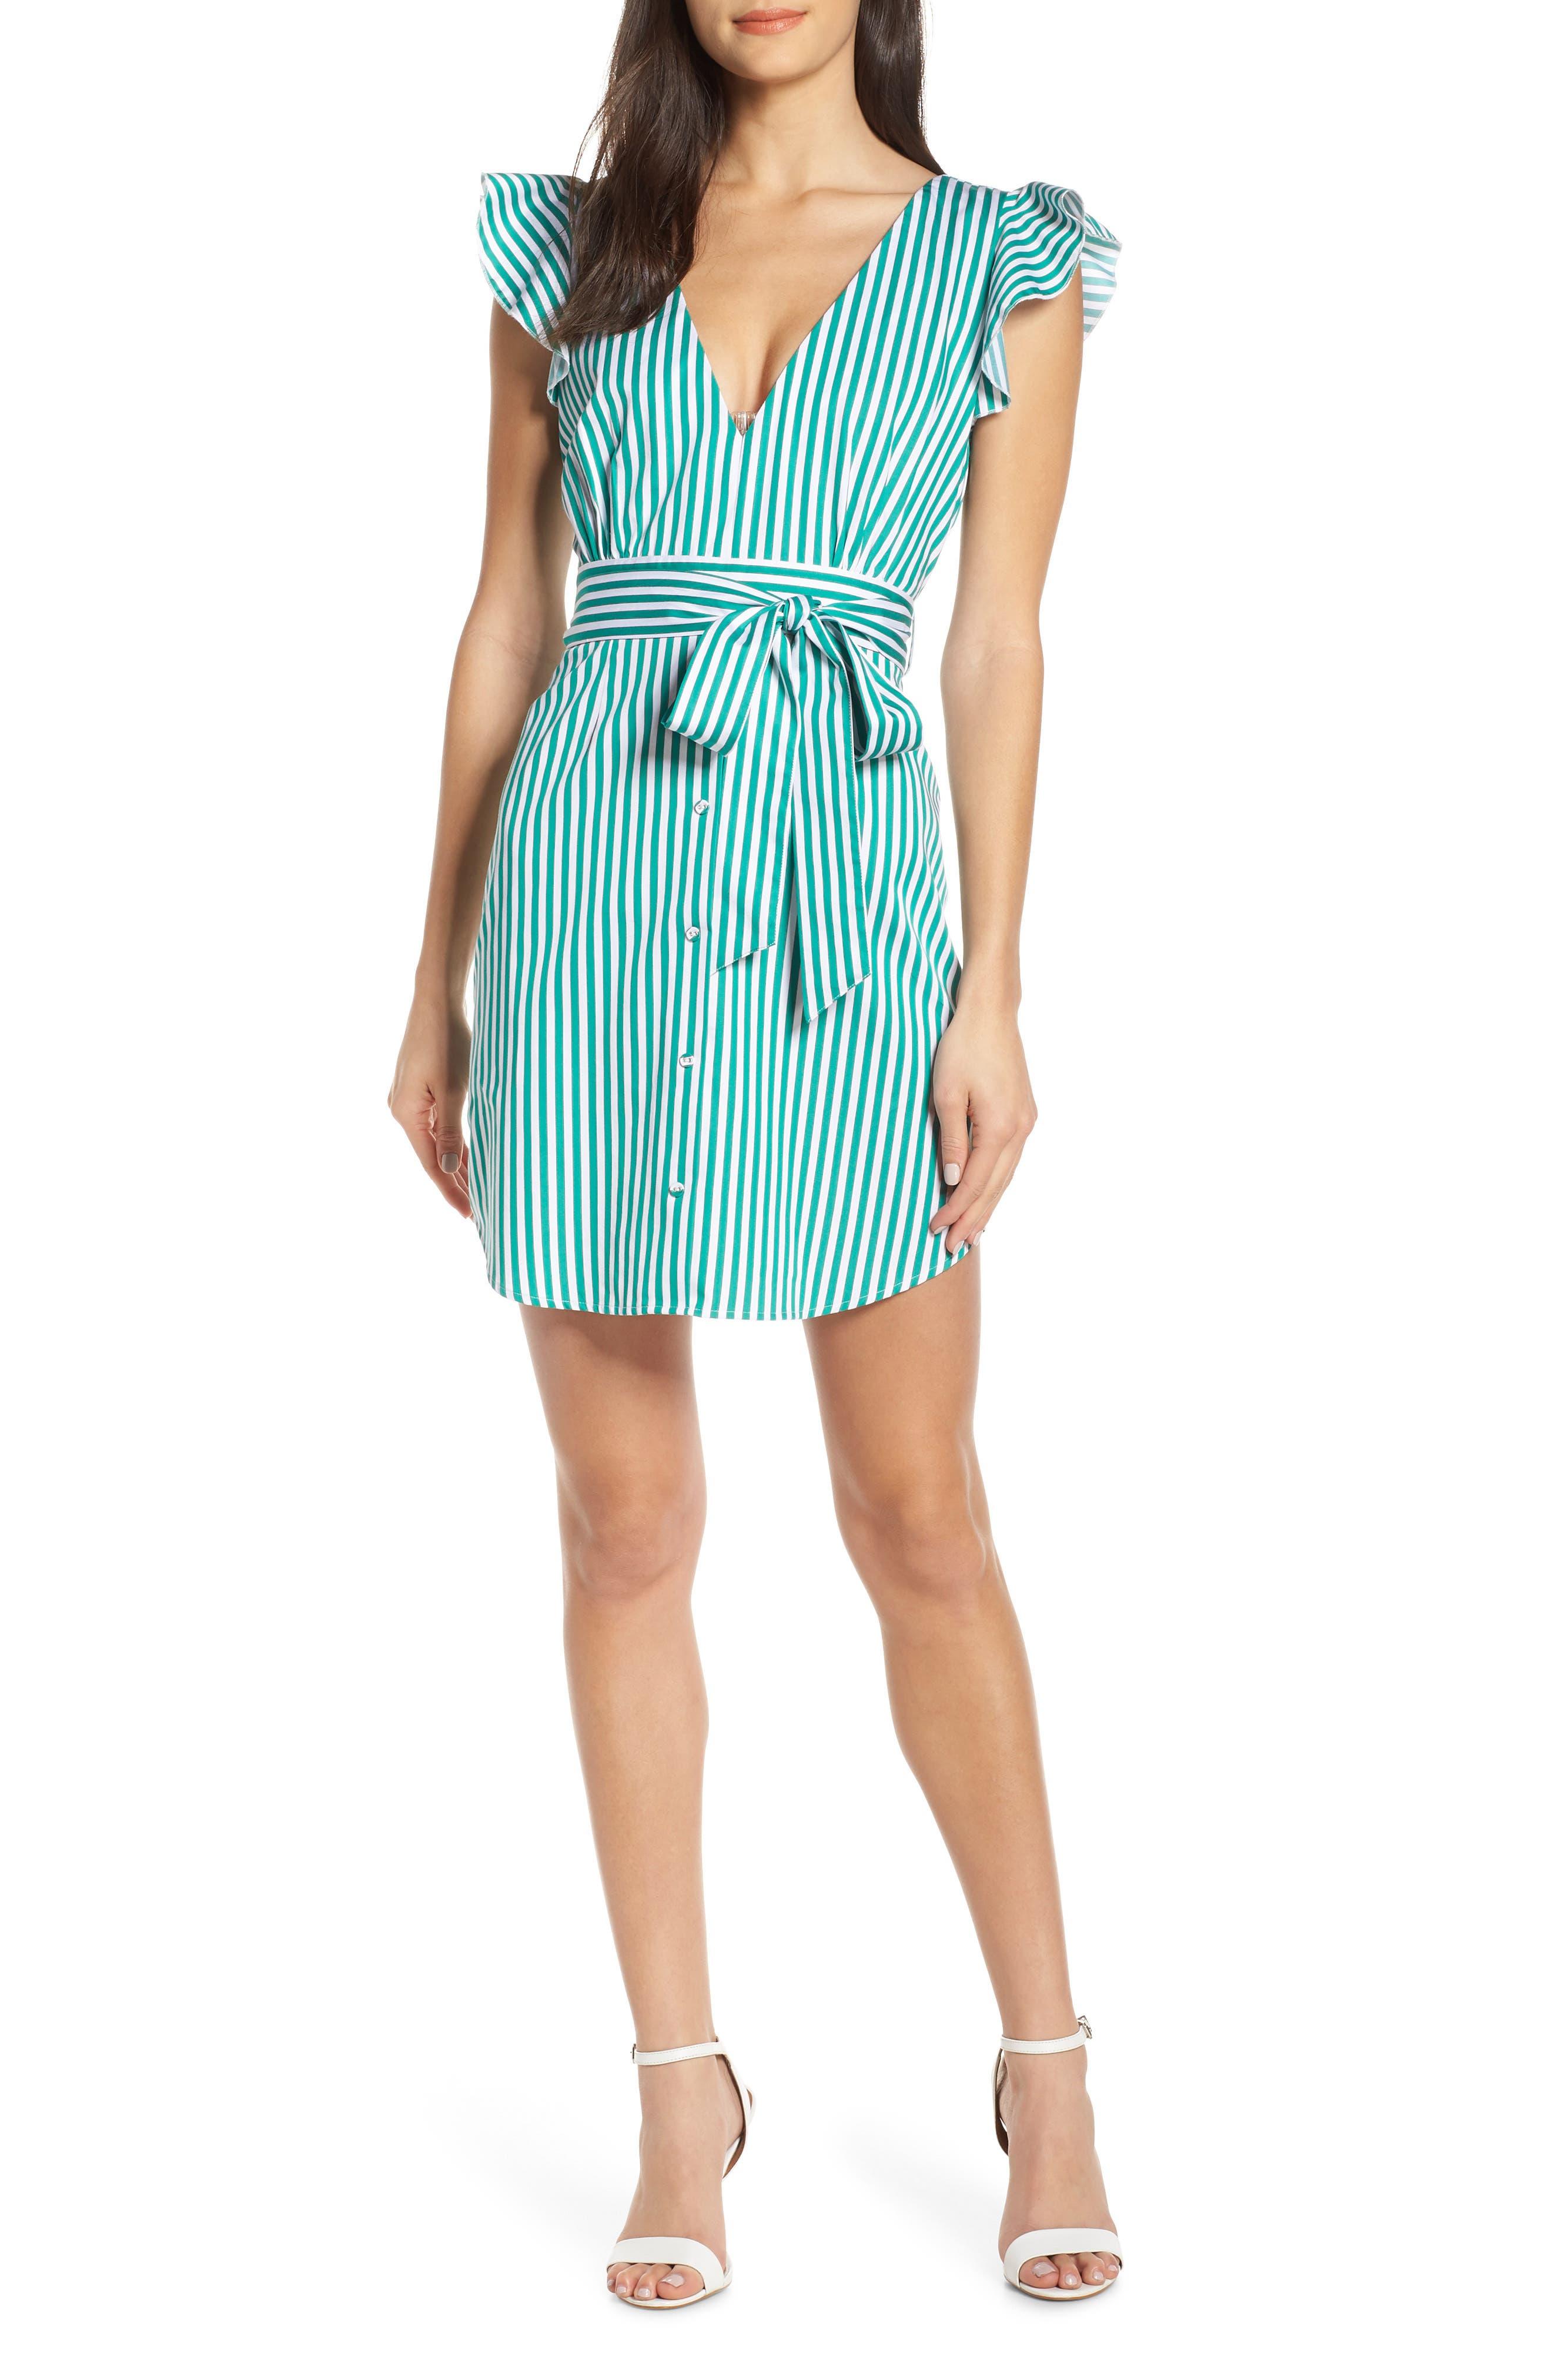 BB DAKOTA, Peppermint Stripe Dress, Main thumbnail 1, color, MISTY JADE